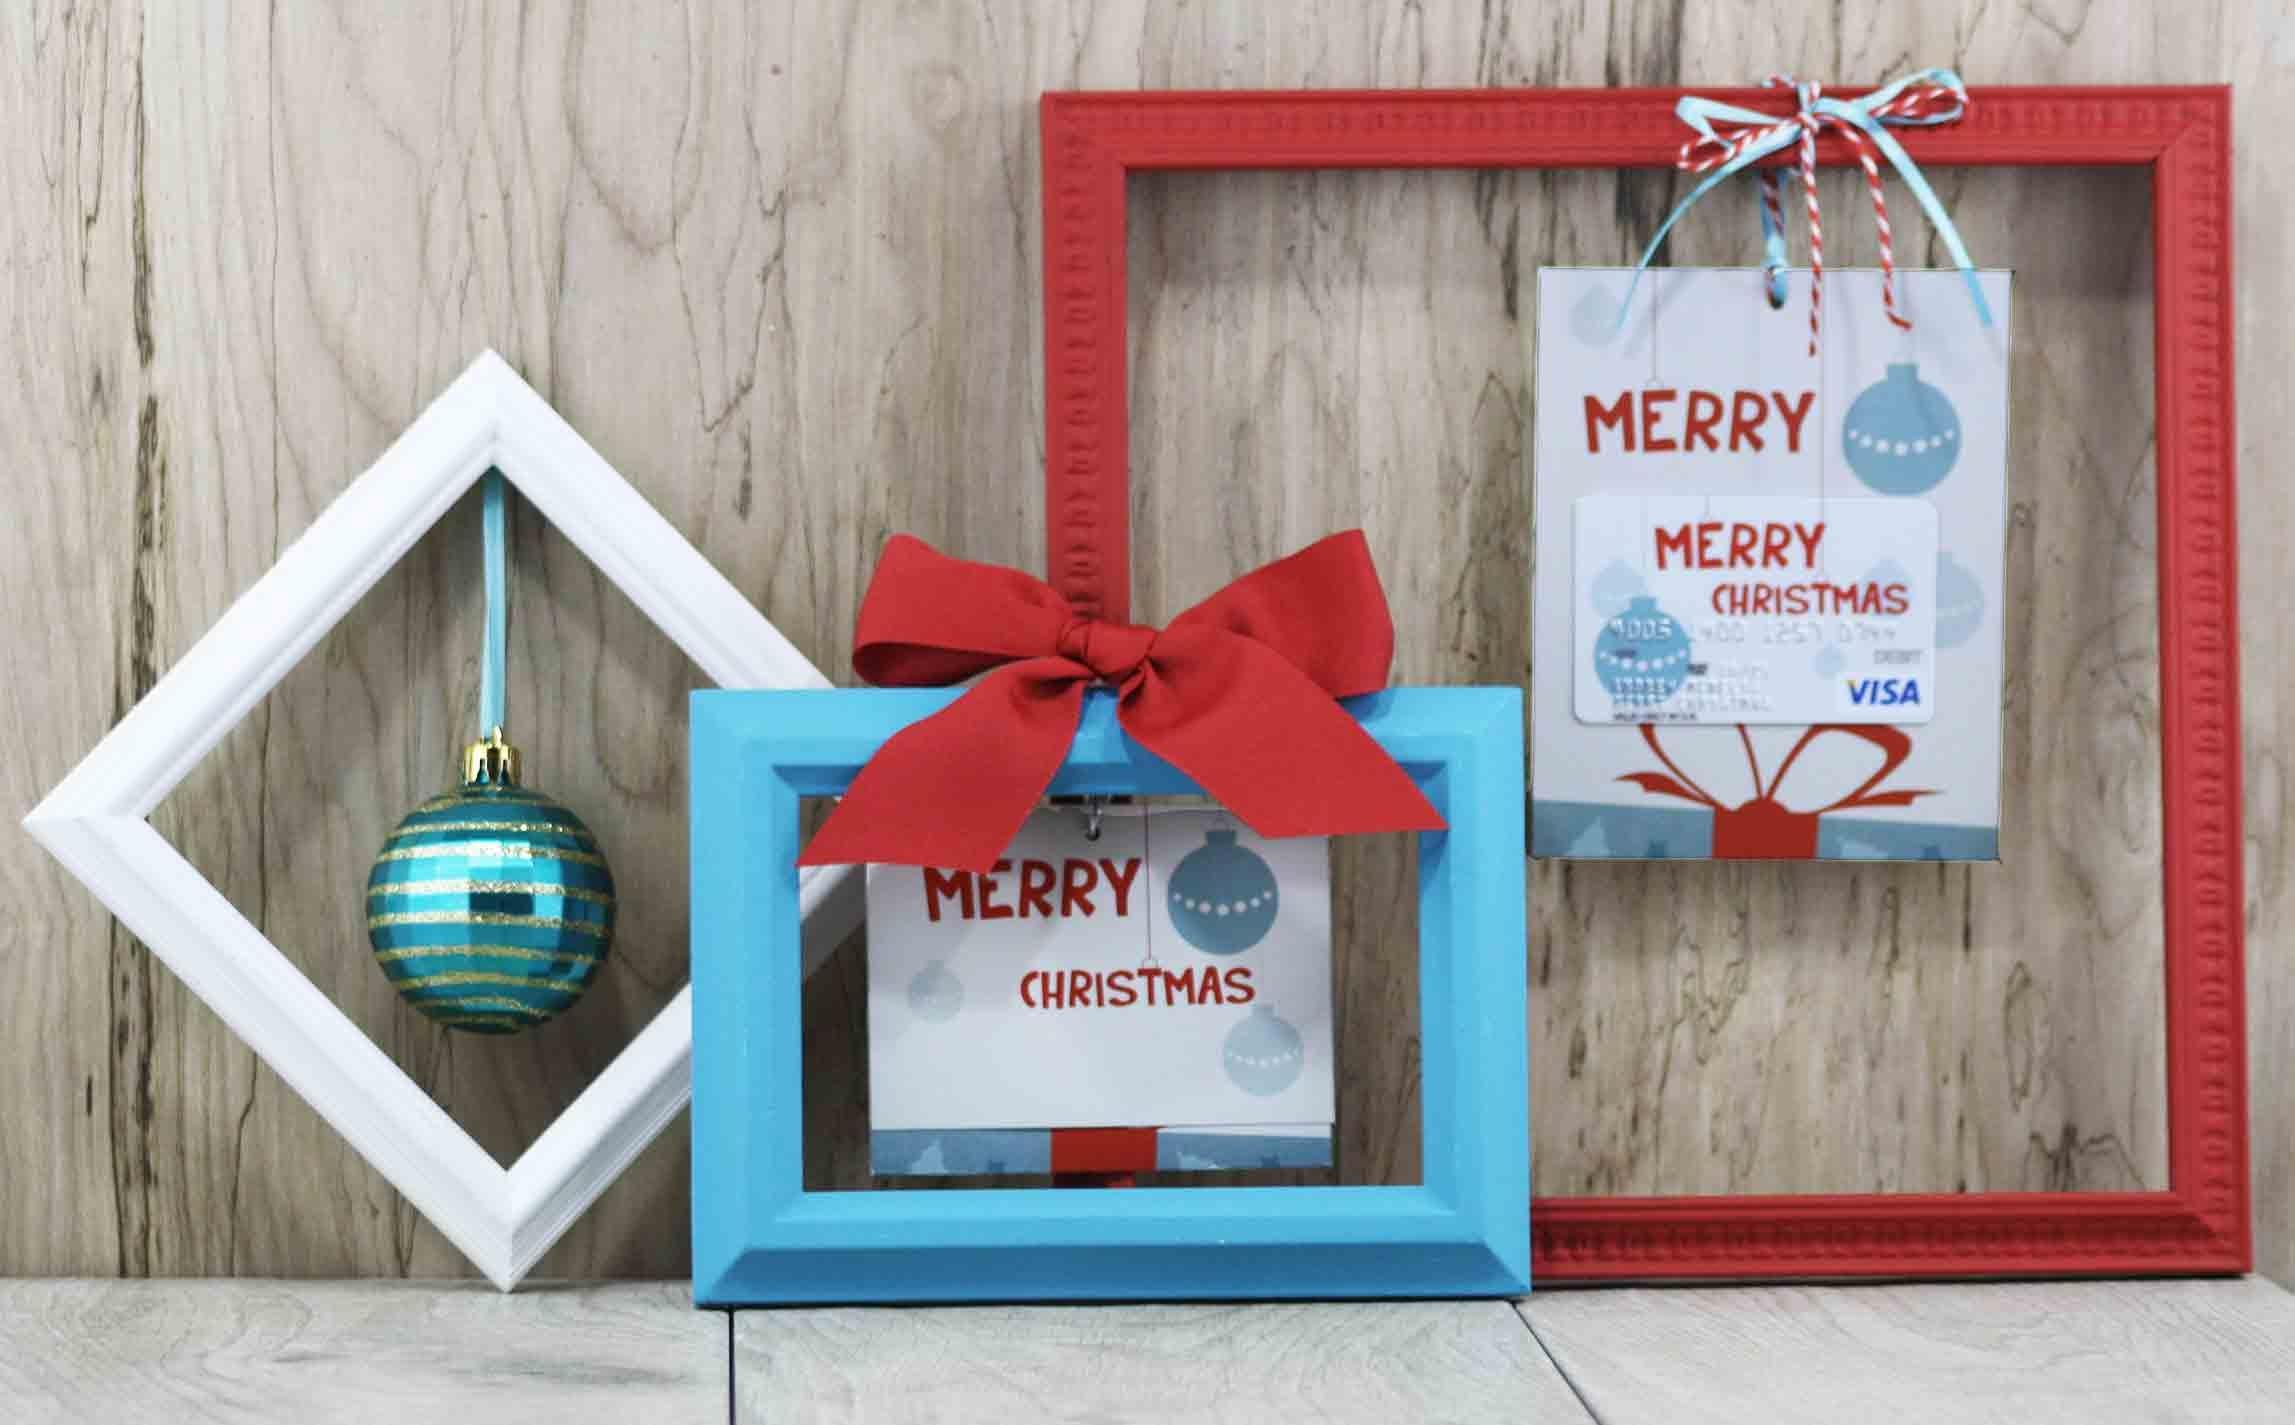 Free Printable} Merry Christmas Gift Card Holder| Gcg - Free Printable Xmas Cards Download